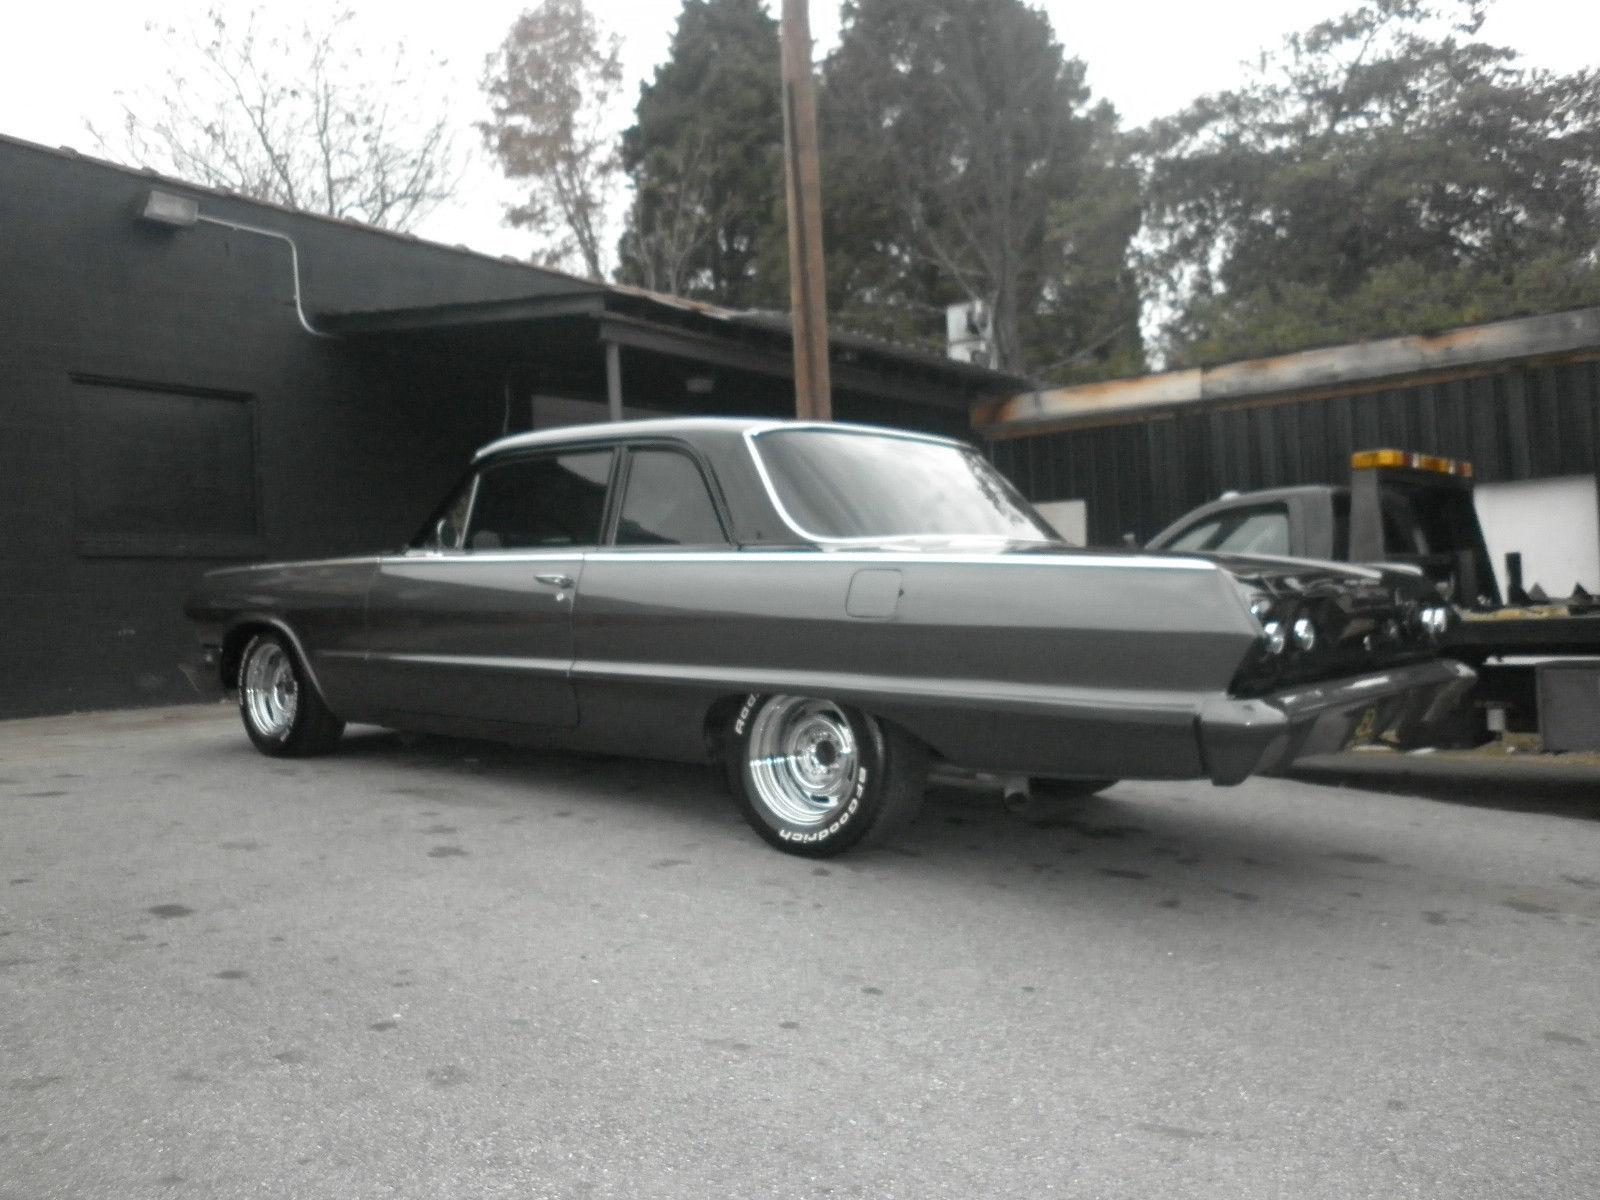 1963 chevrolet biscayne impala 2 door post classic chevrolet impala 1963 for sale. Black Bedroom Furniture Sets. Home Design Ideas